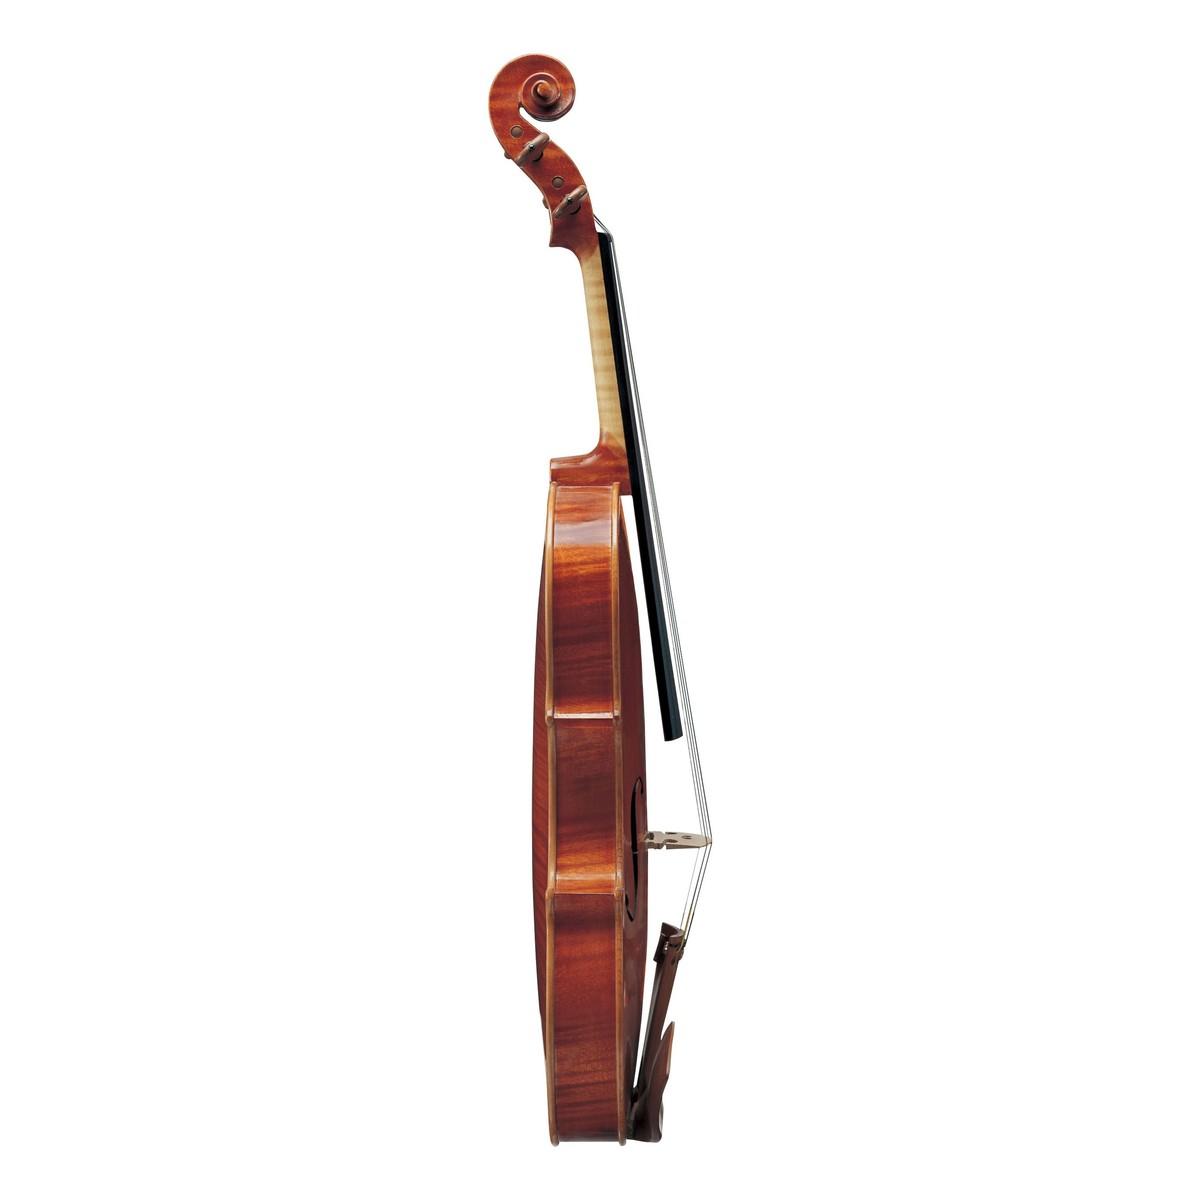 Yamaha yvn100g professional violin 4 4 size instrument for Violin yamaha 4 4